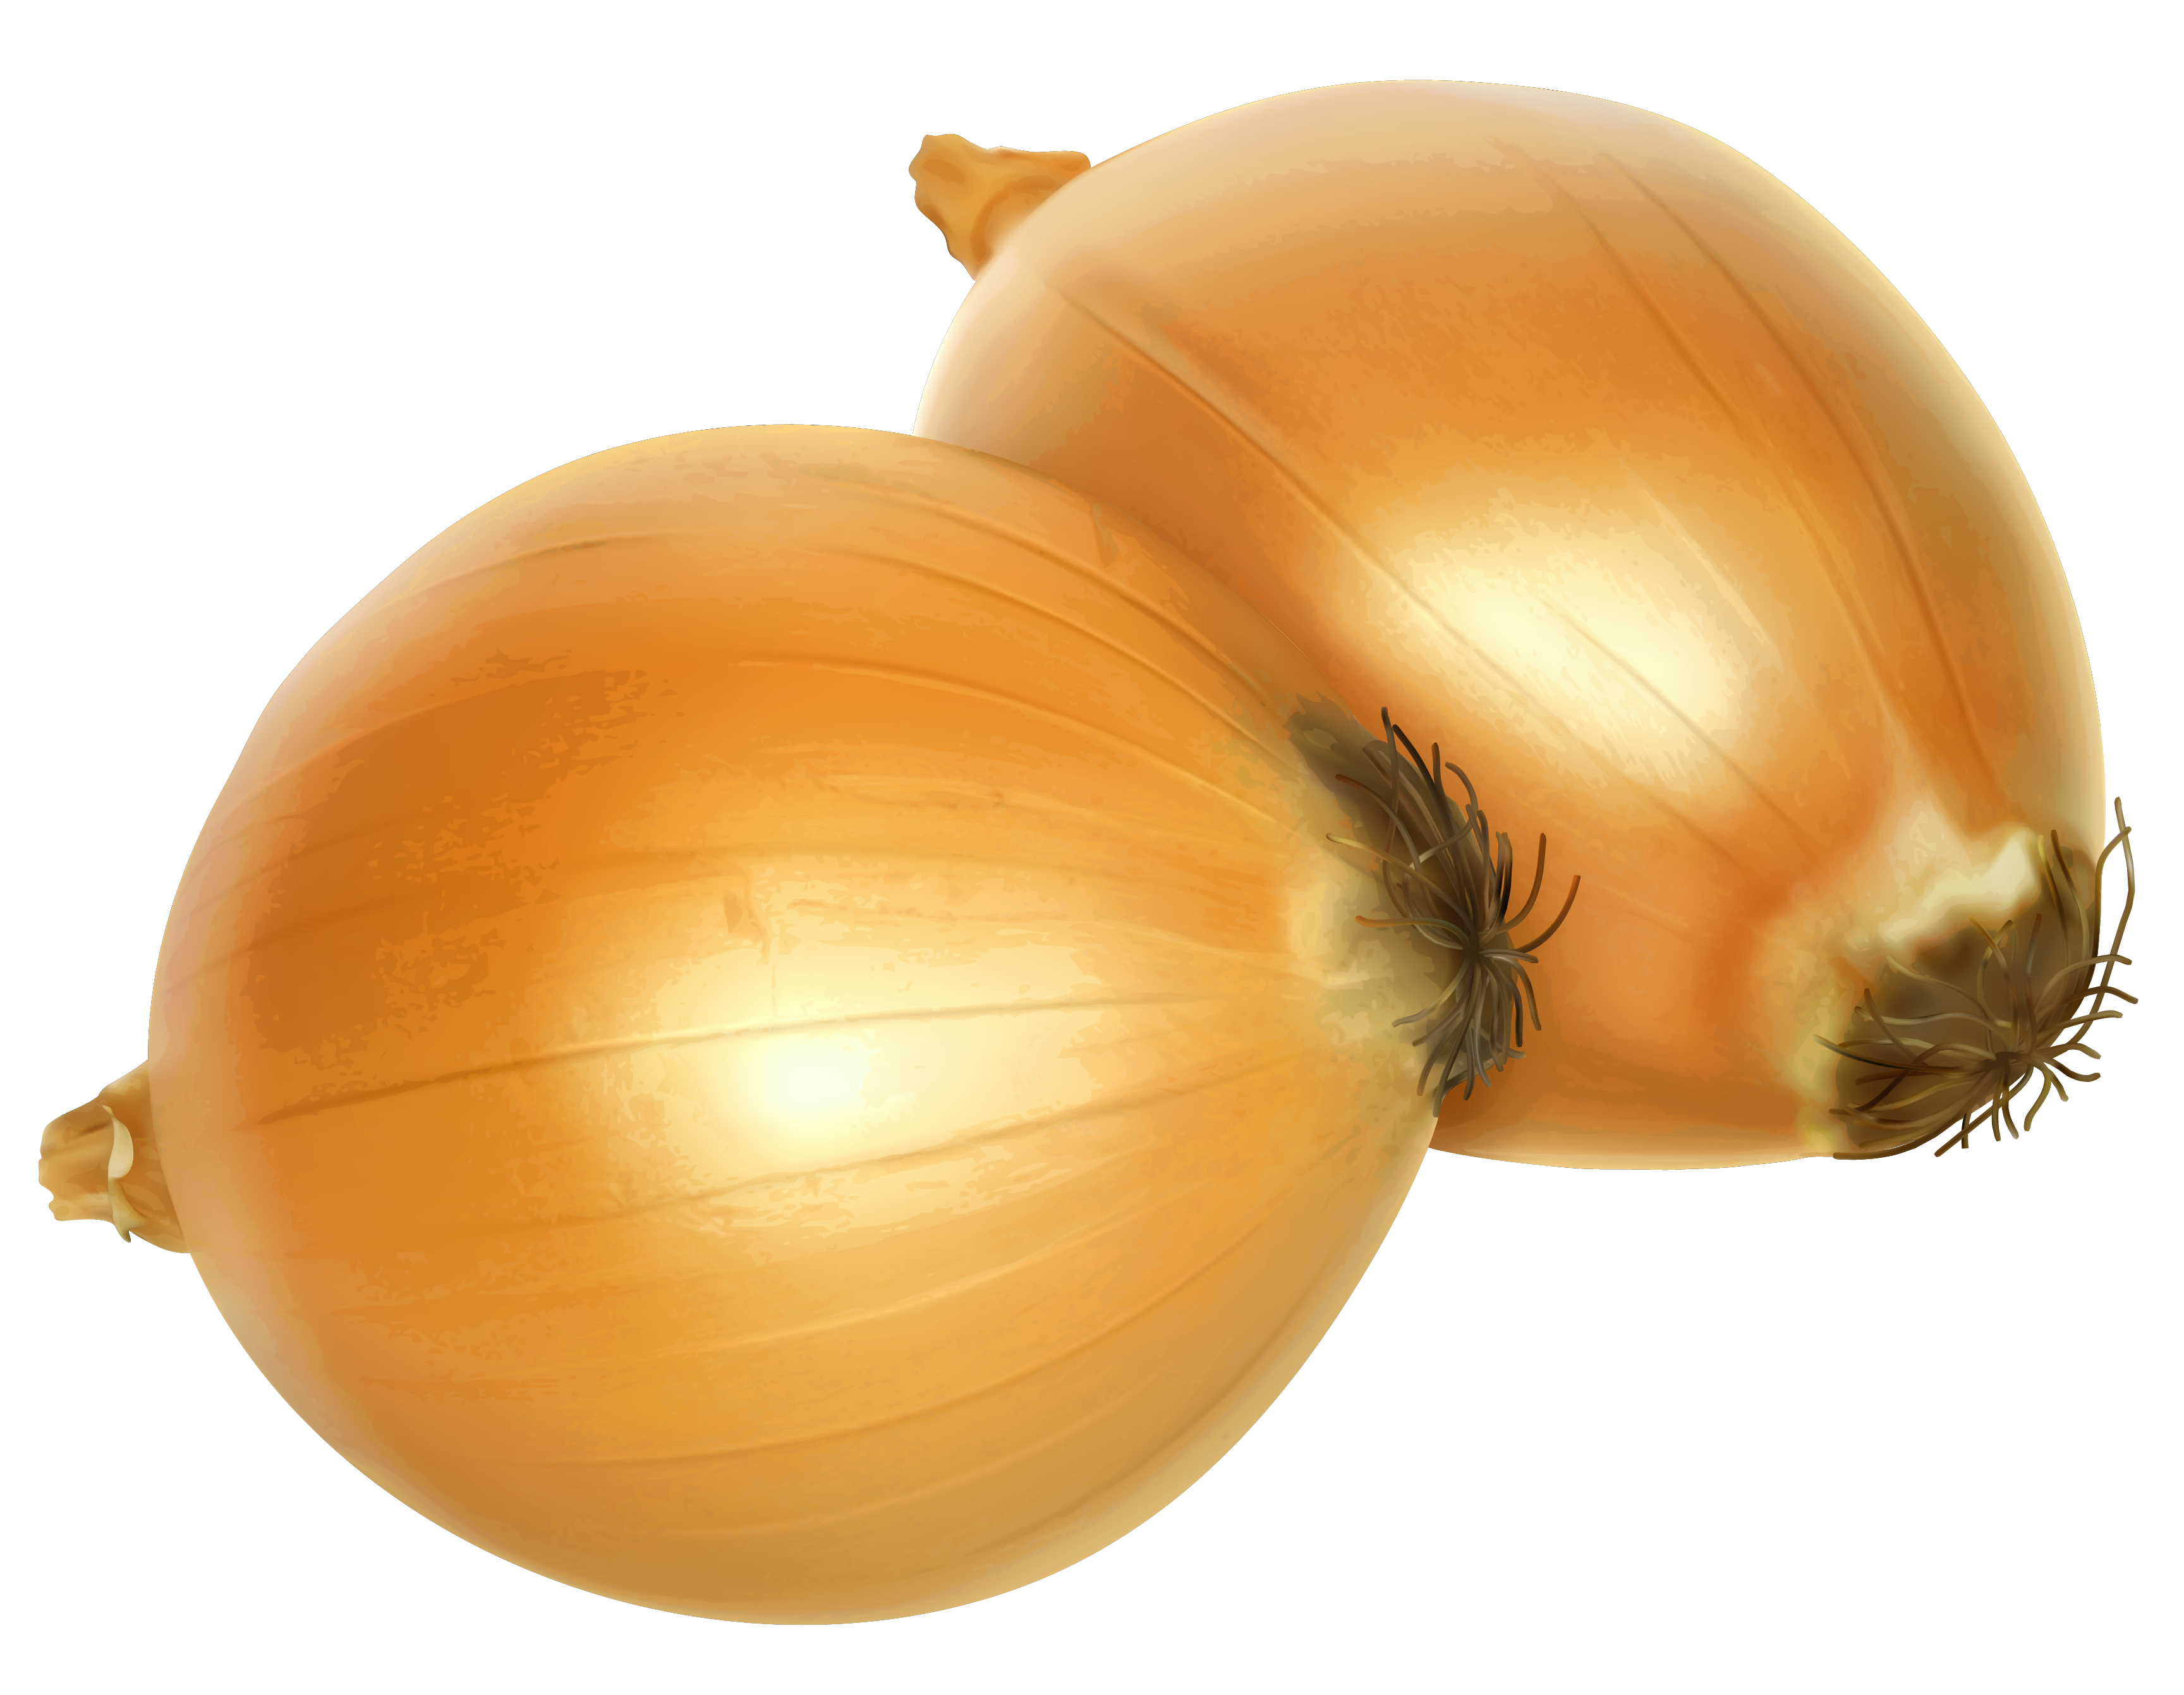 Winter onion clipart - Clipground